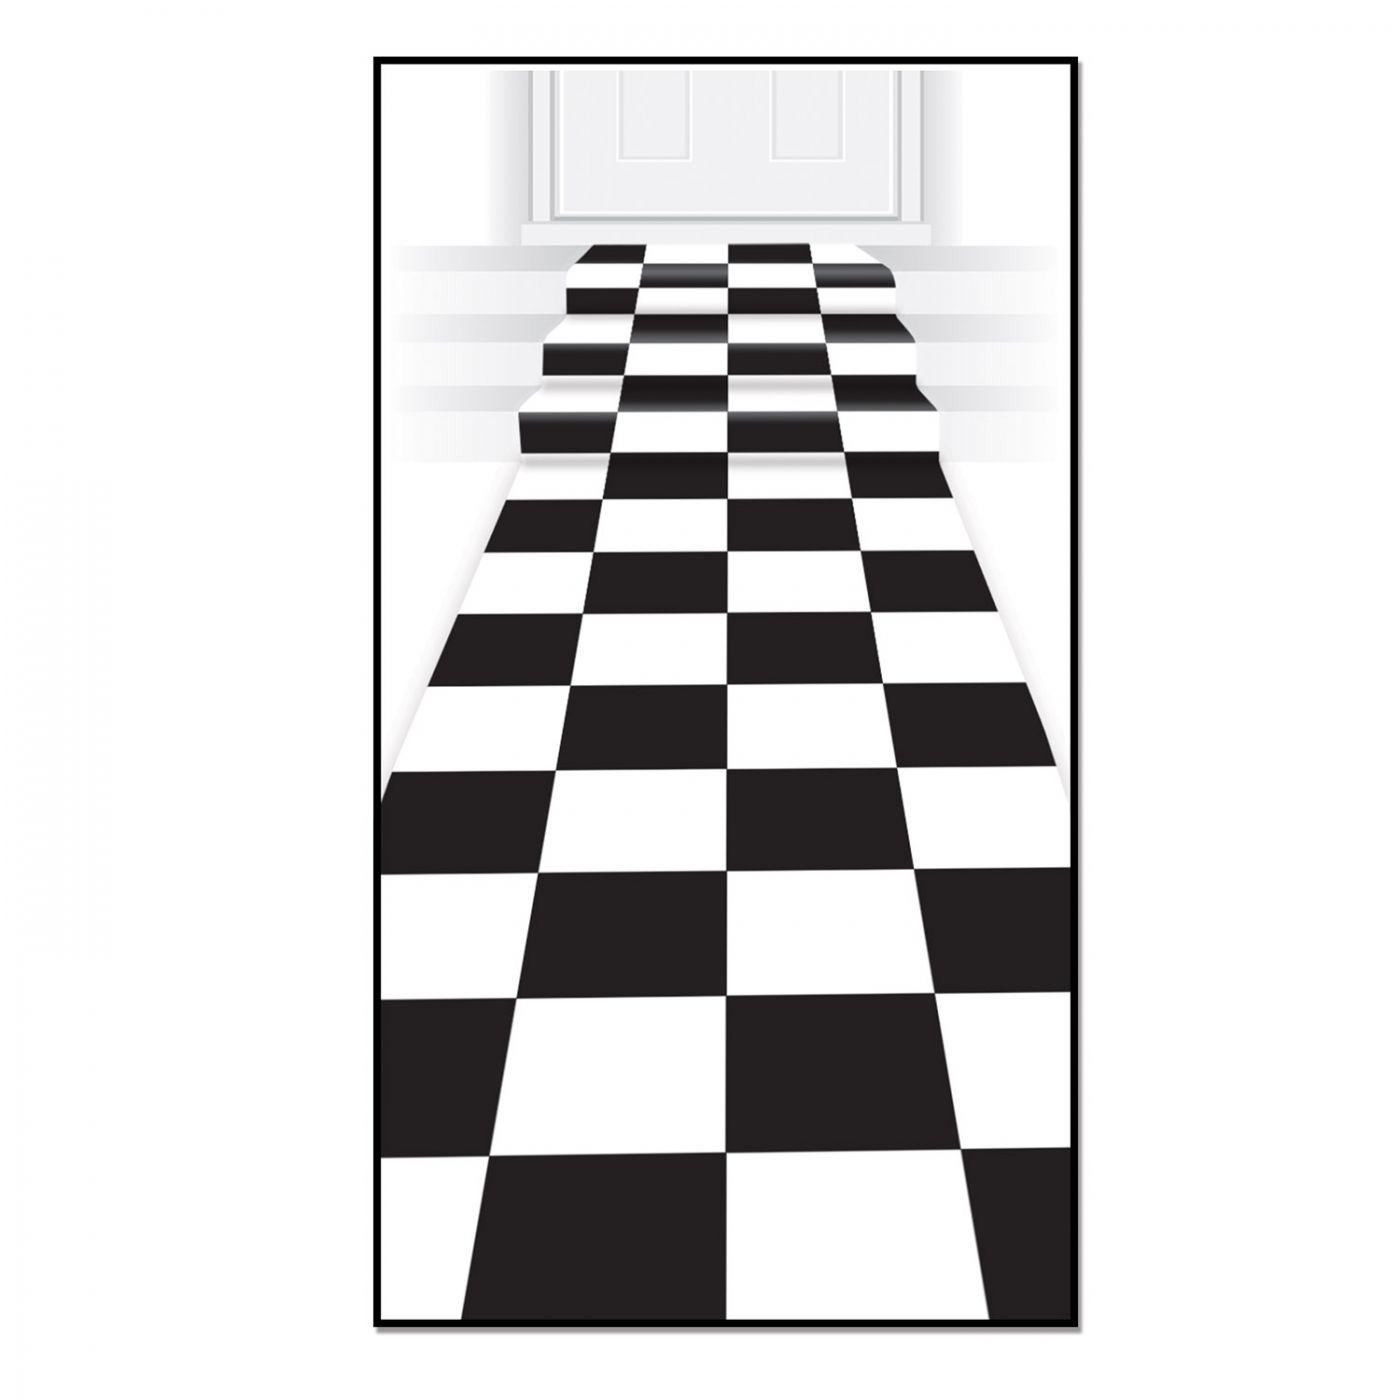 Checkered Runner (6) image